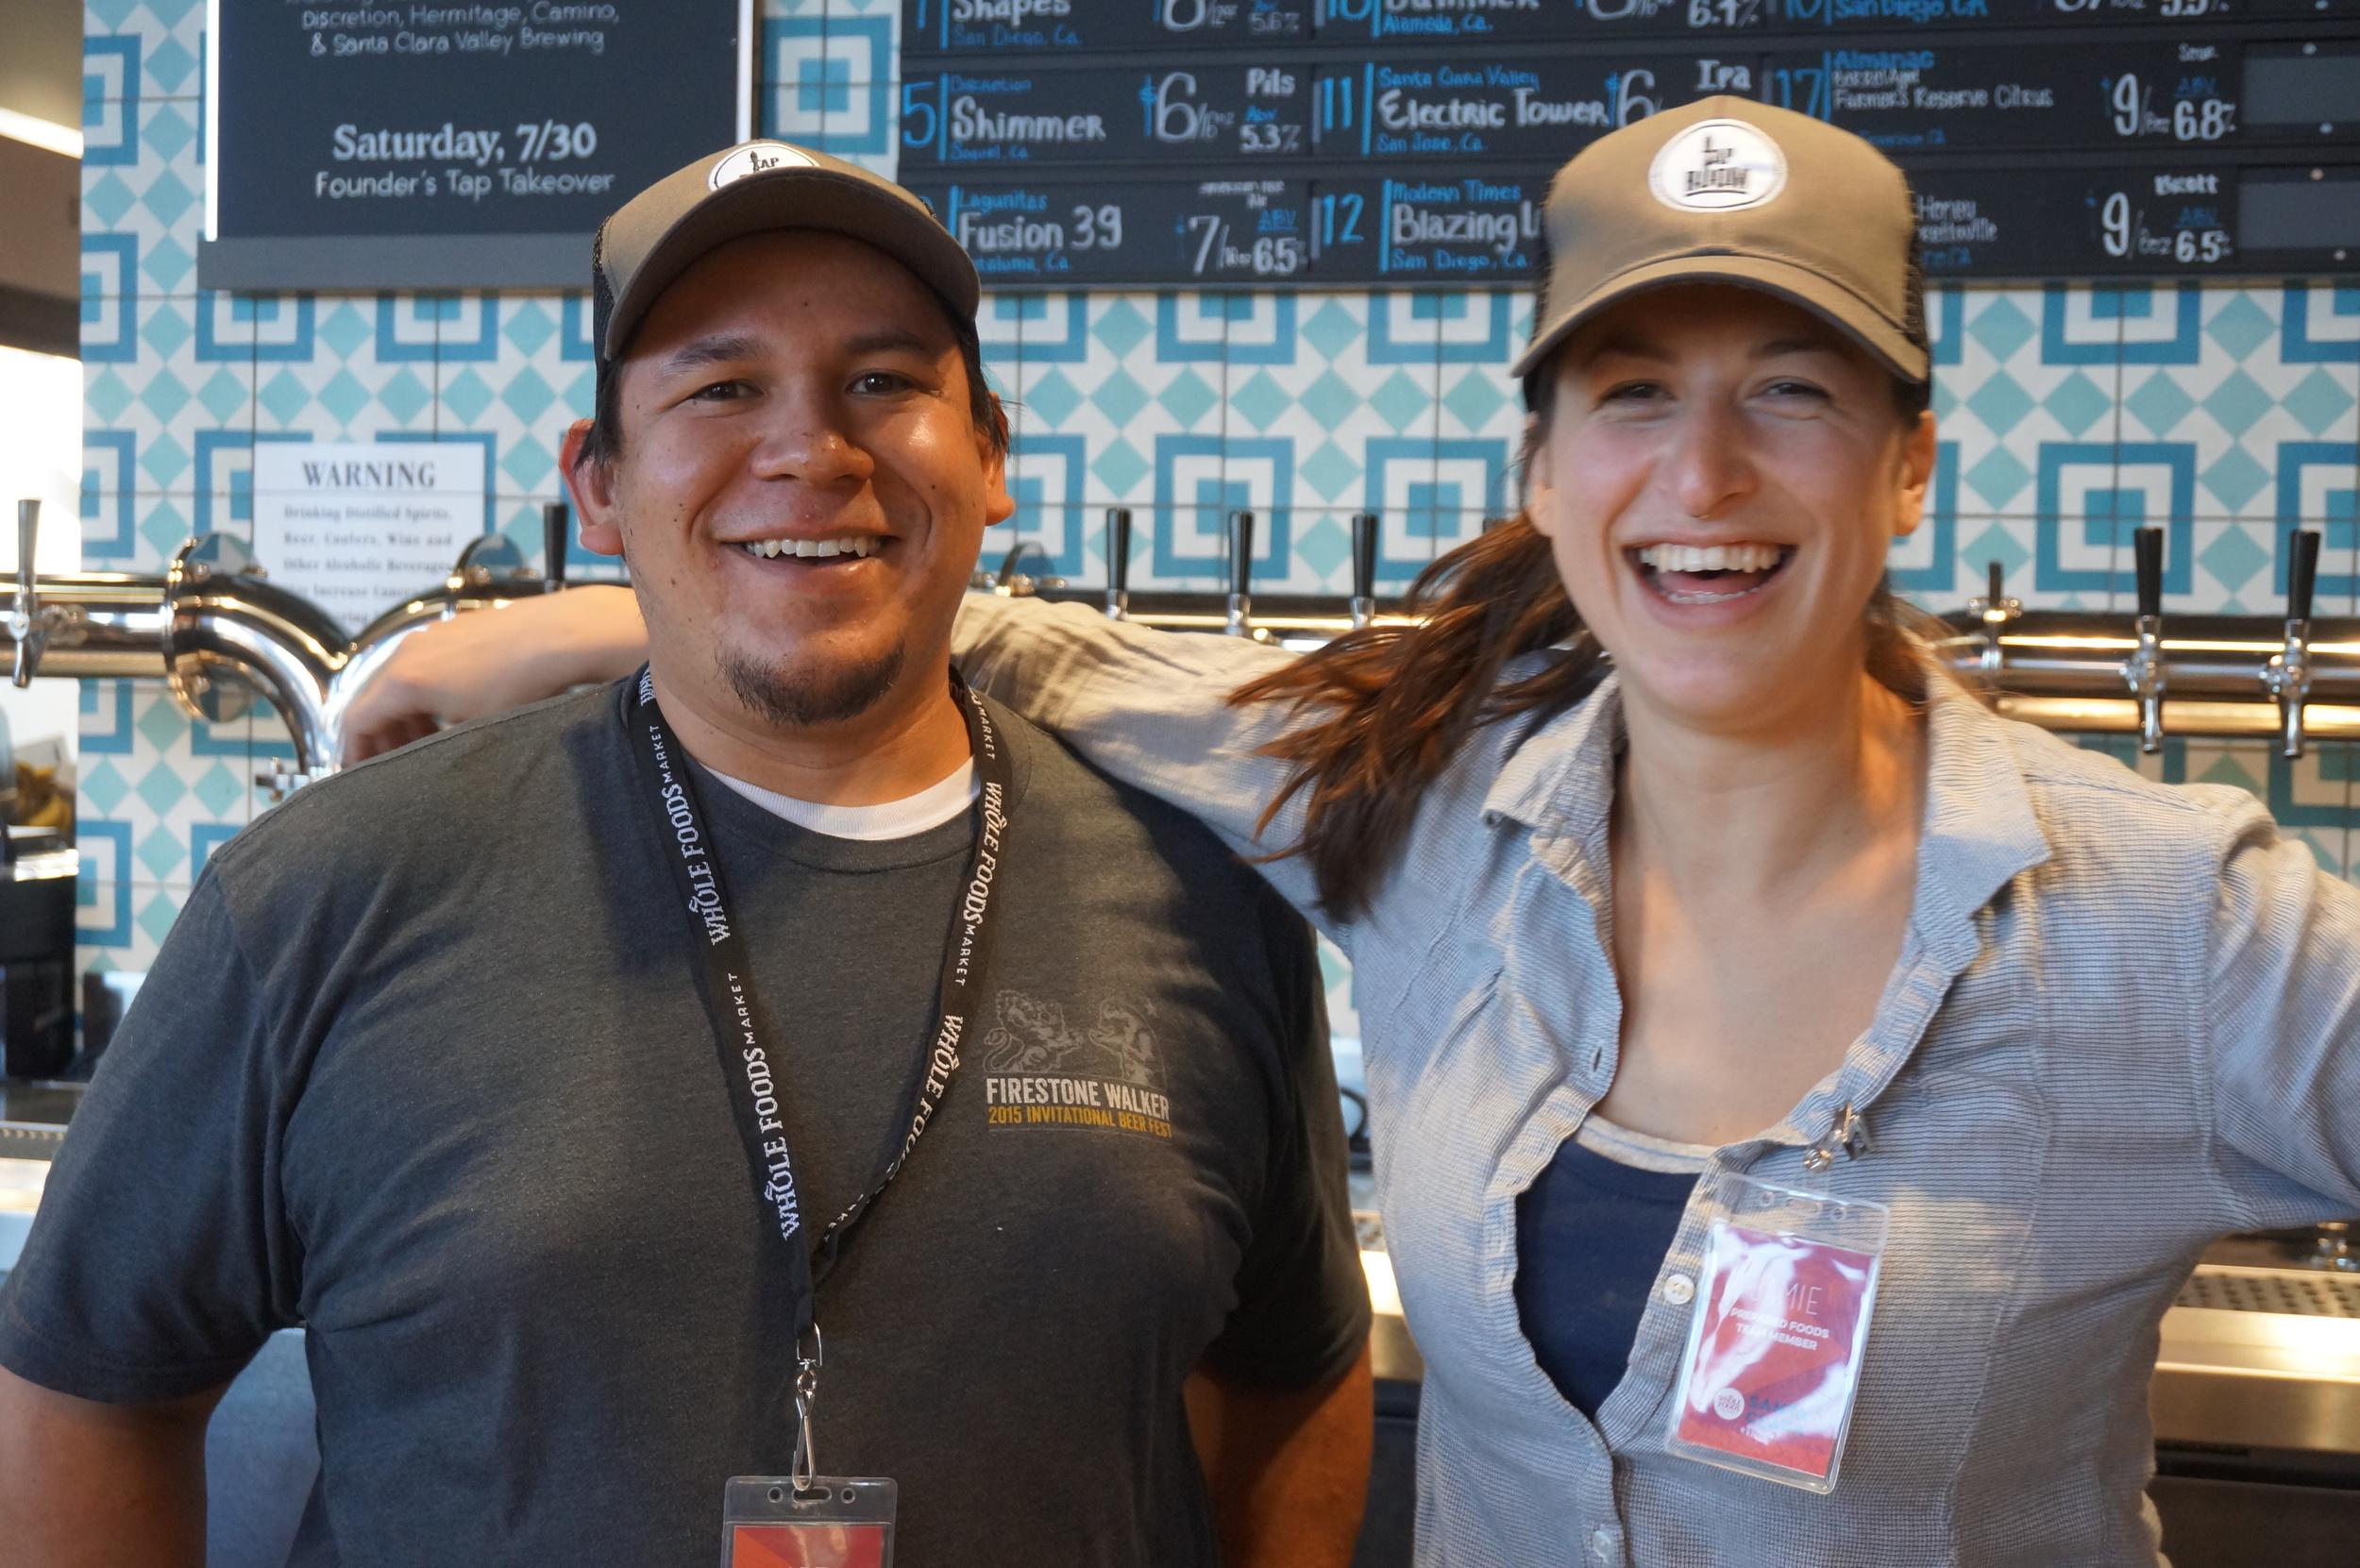 Whole Foods Santa Clara - My Newest Beer Haven